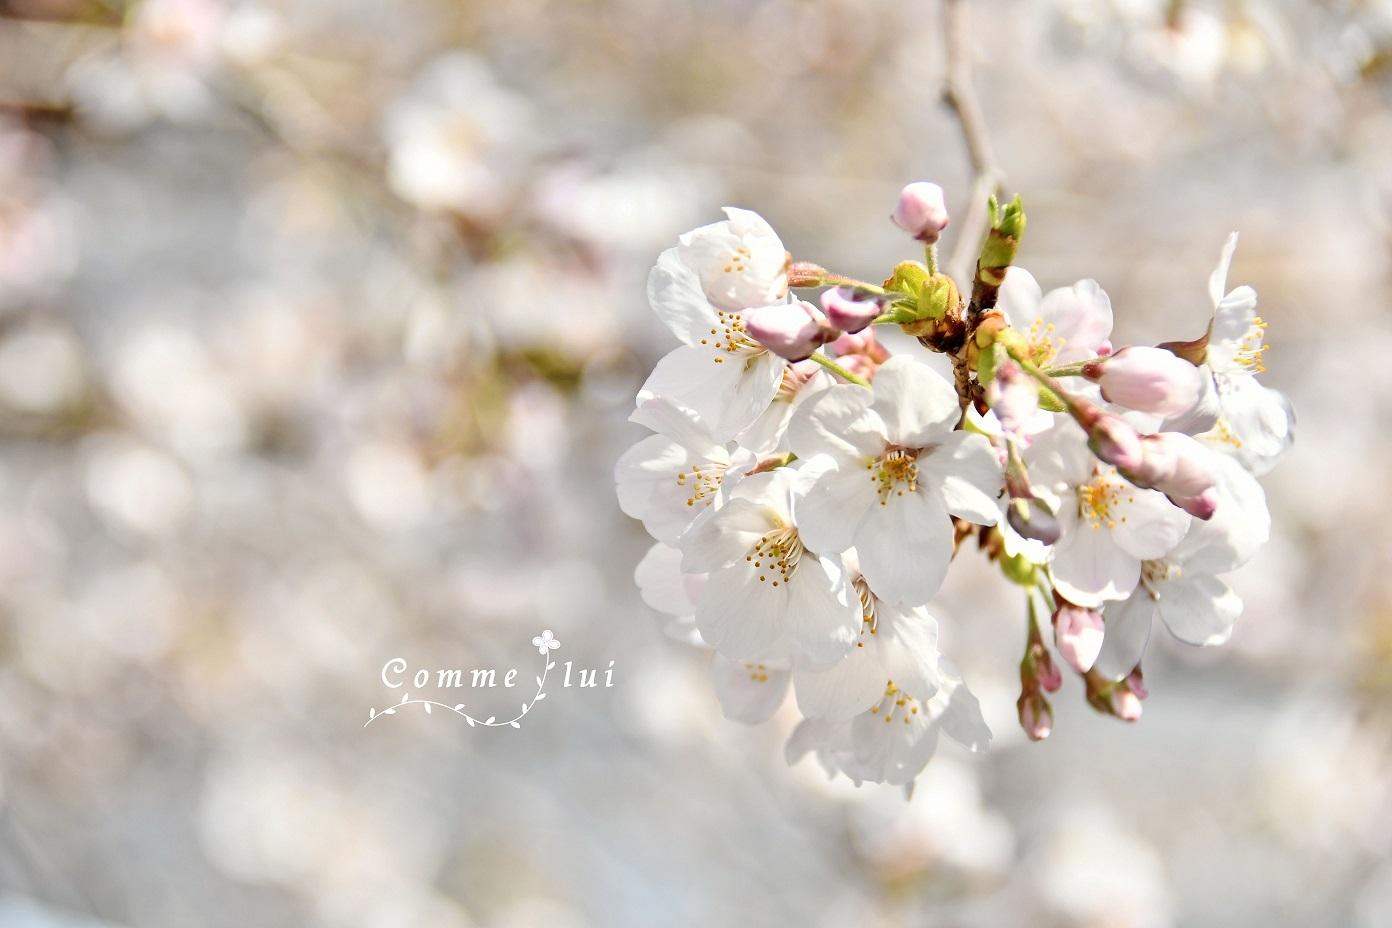 Spring has come_a0192475_09463398.jpg